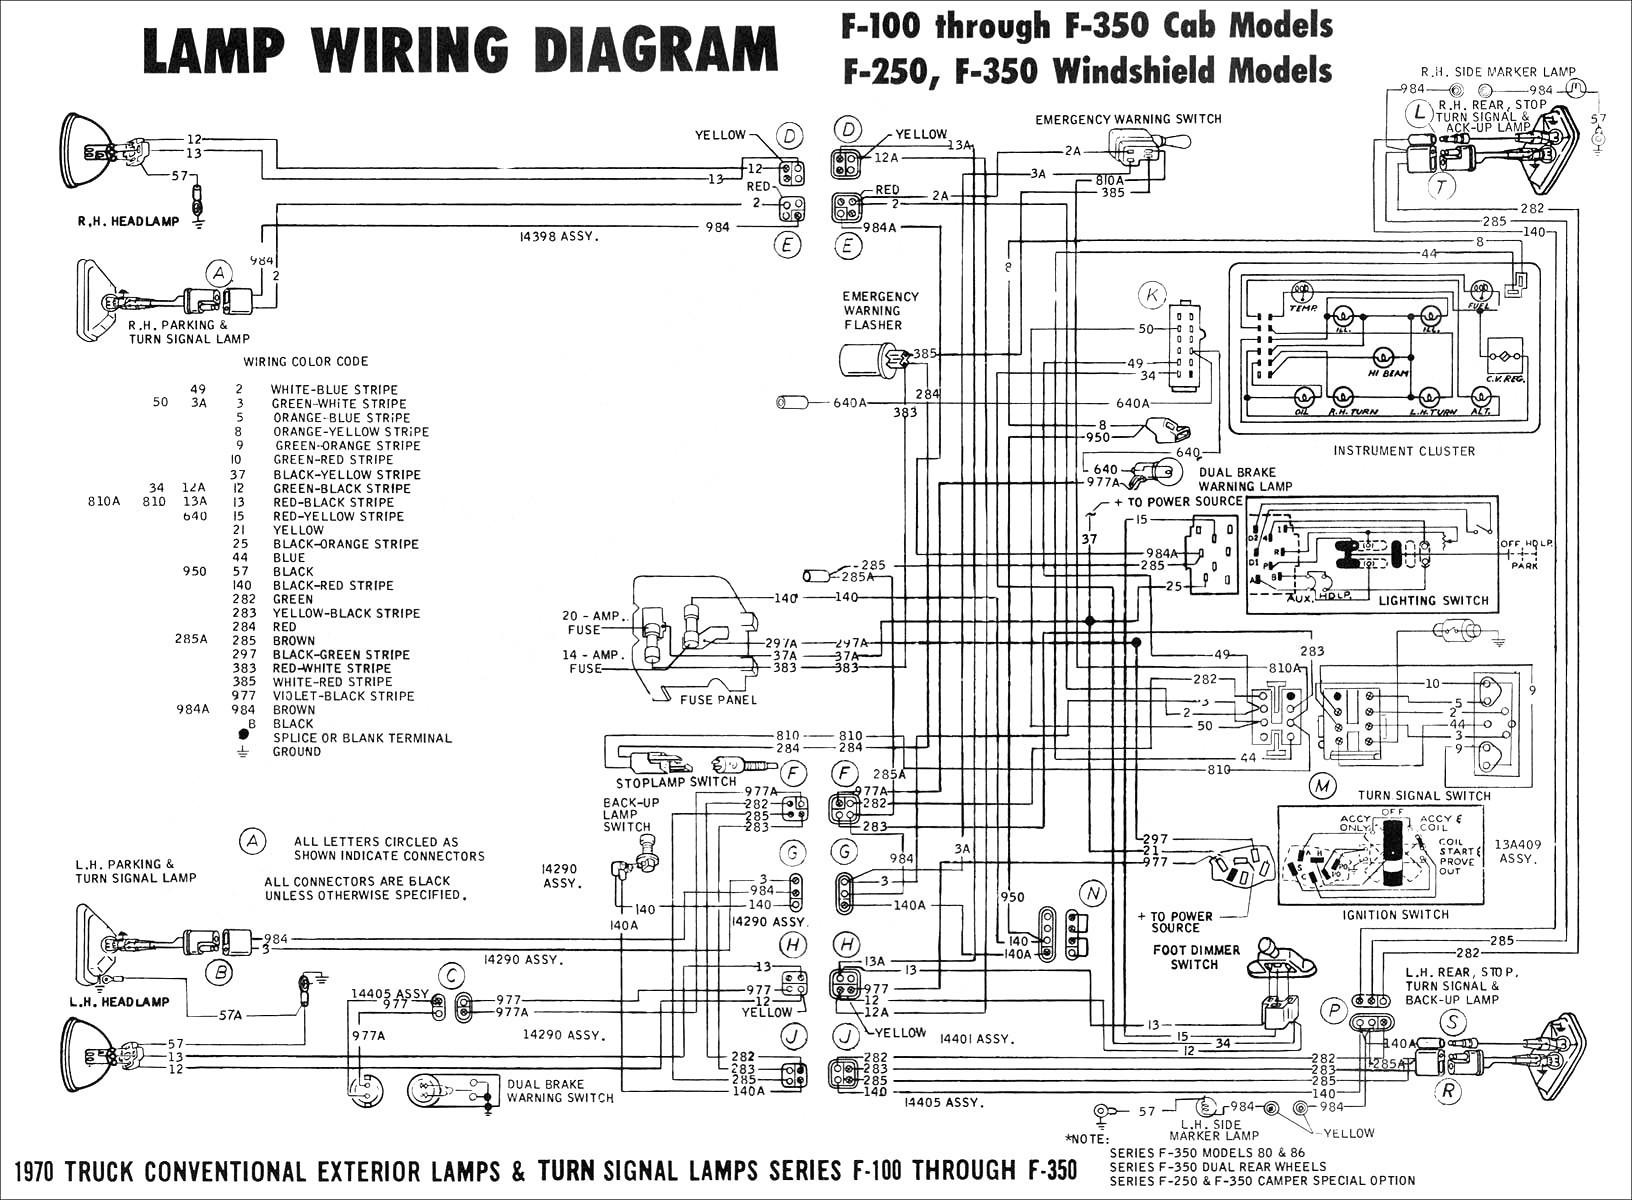 Jeep Wrangler Radio Wiring Diagram 2001 Jeep Wrangler Radio Wiring Diagram Simplified Shapes 2001 Audi Of Jeep Wrangler Radio Wiring Diagram